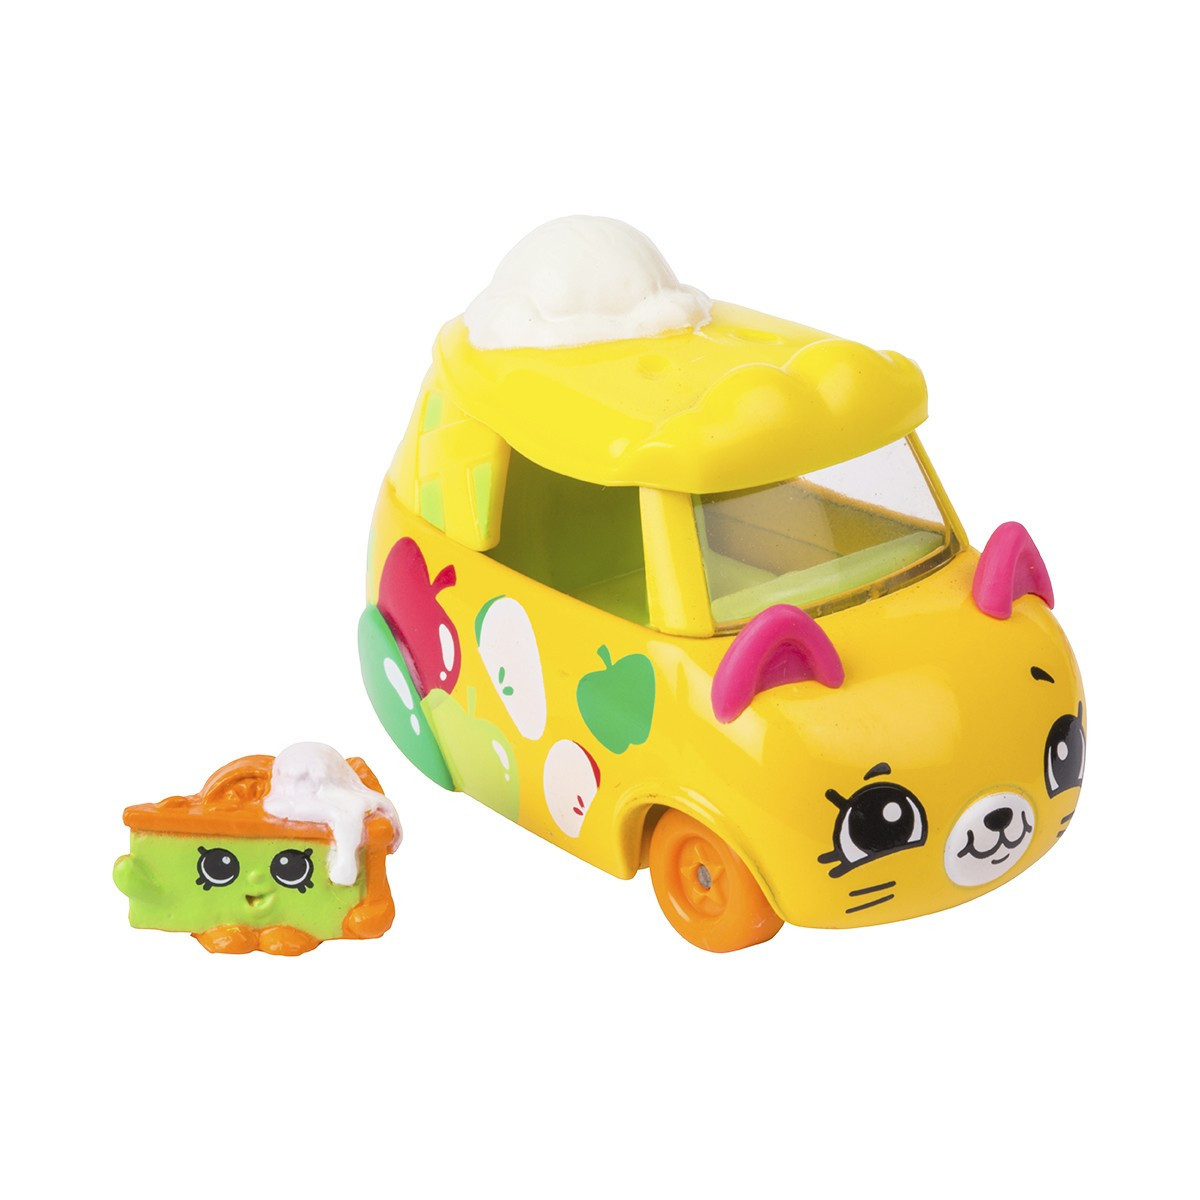 Мини-машинка SHOPKINS CUTIE CARS S3 - БЫСТРЫЙ ПИРОЖОК (с мини-шопкинсом)